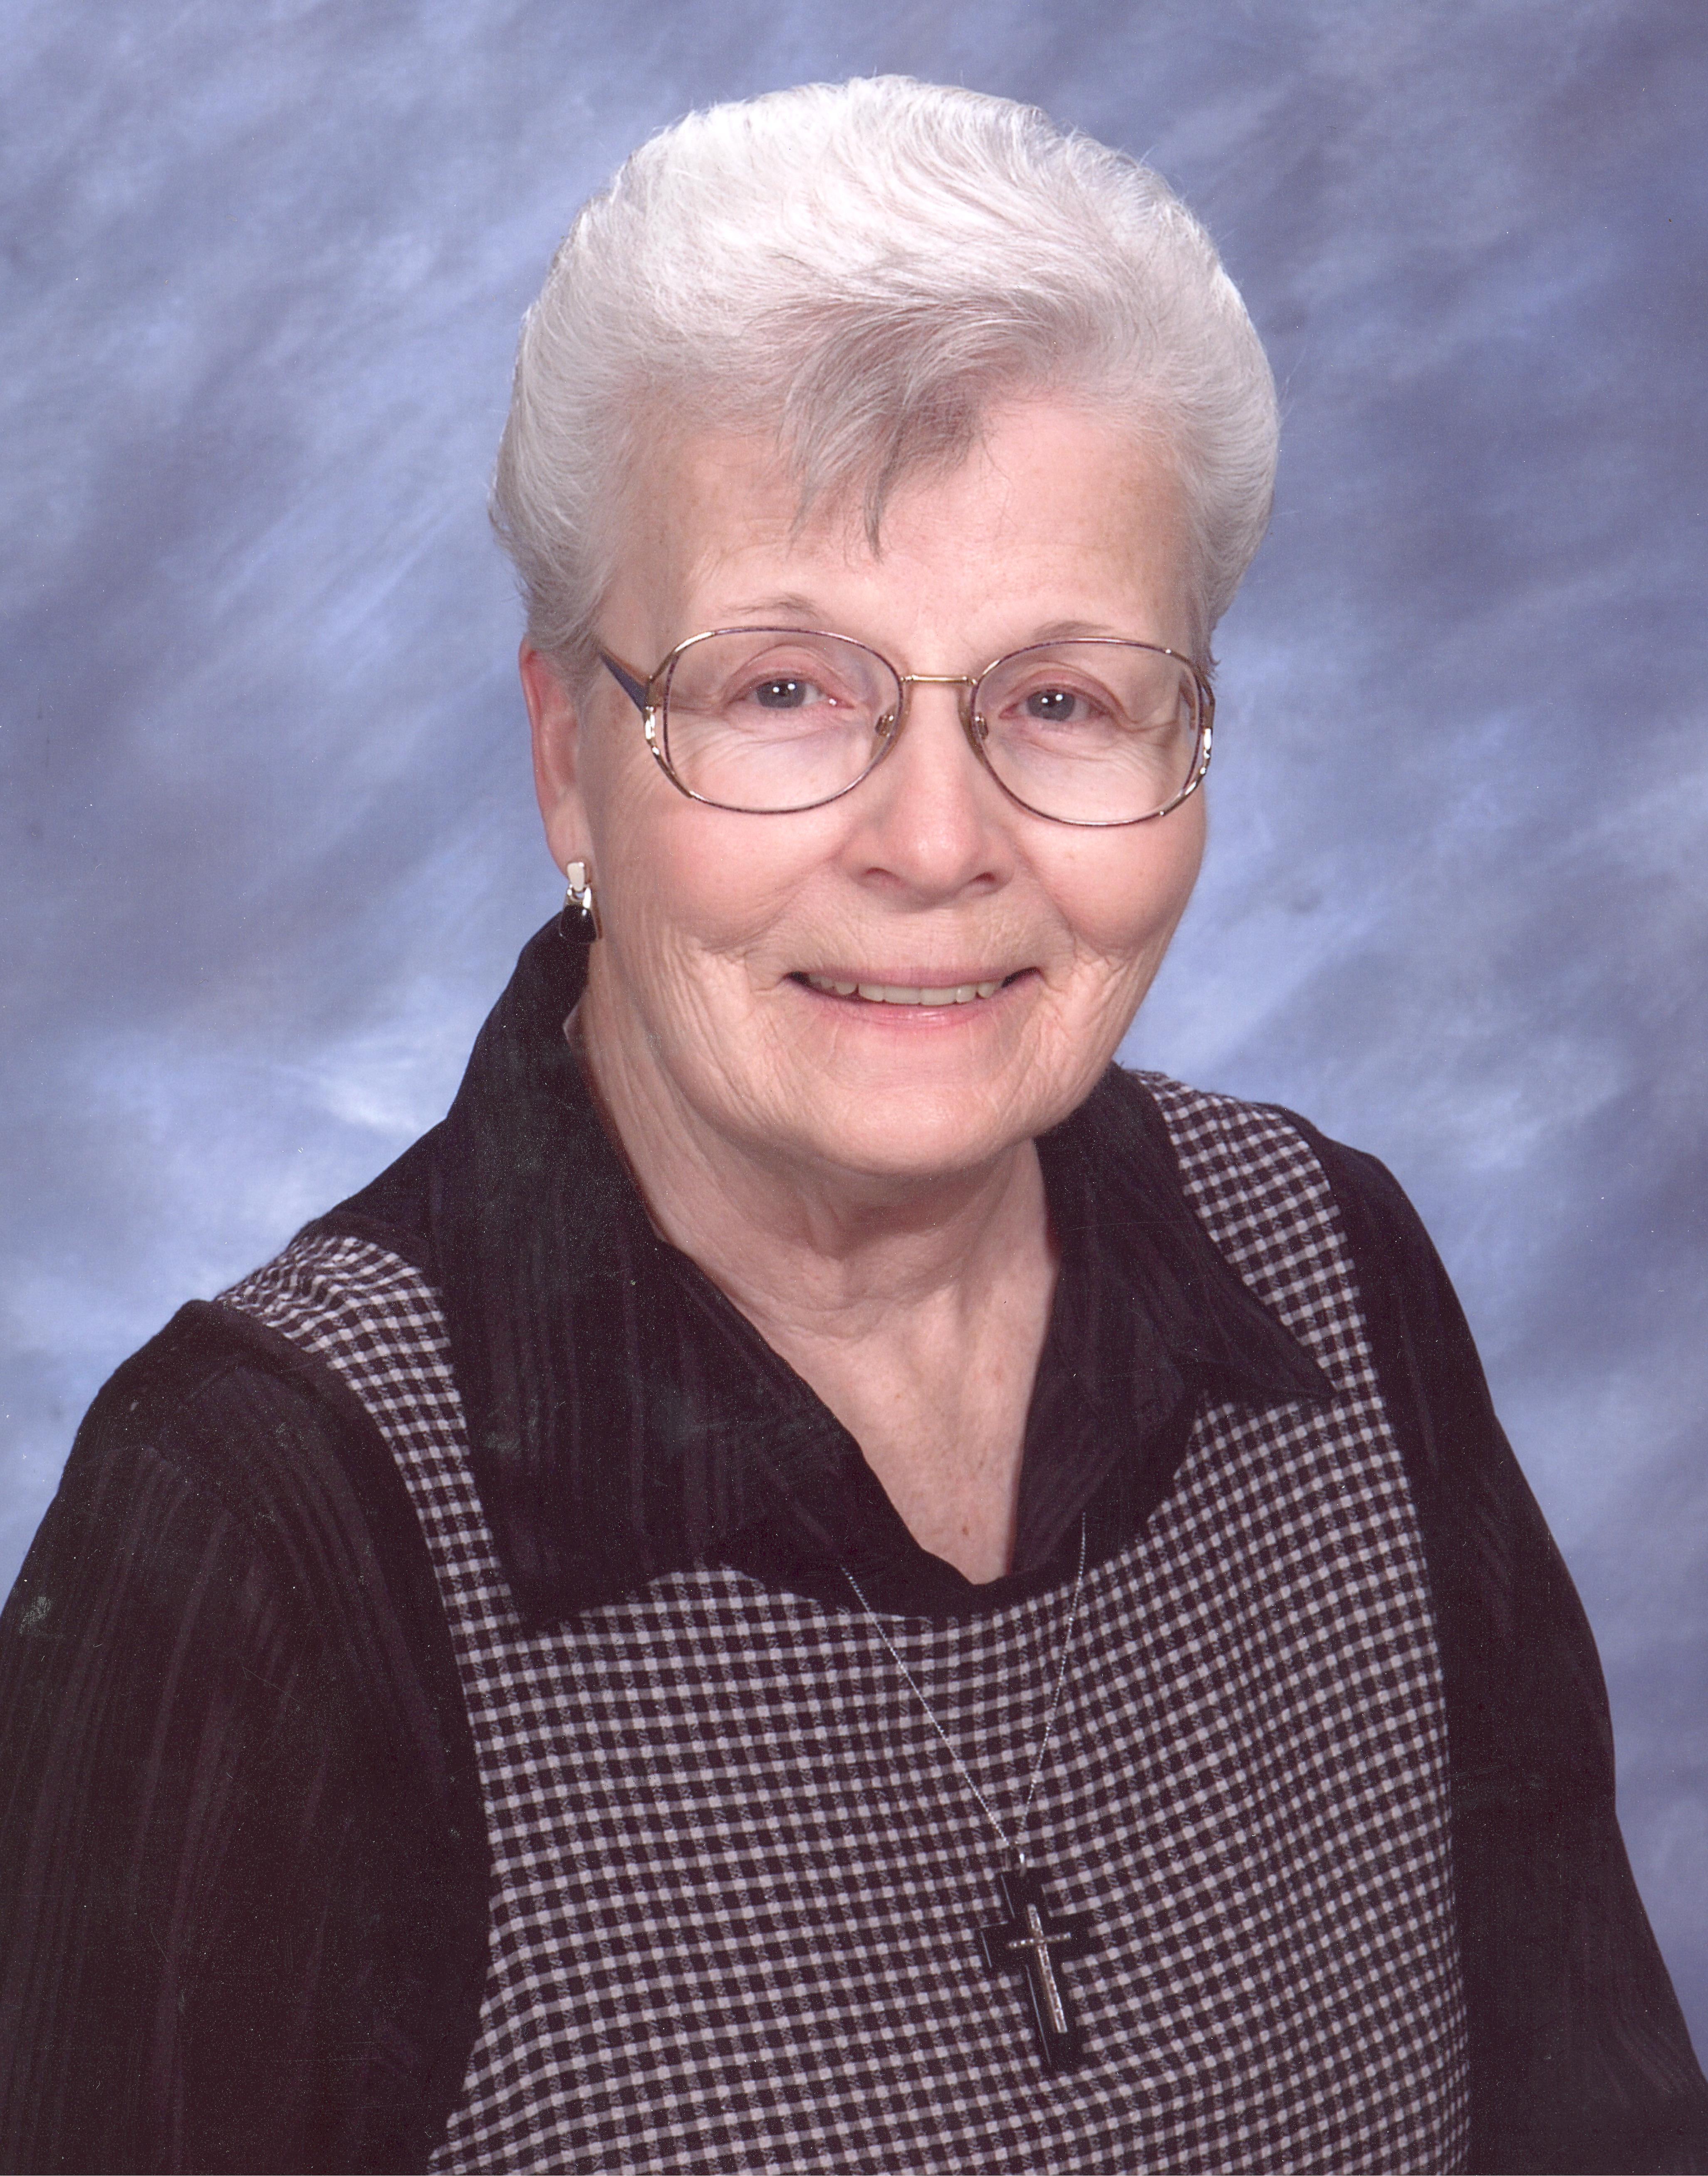 deanna w herron age 79 of east helena